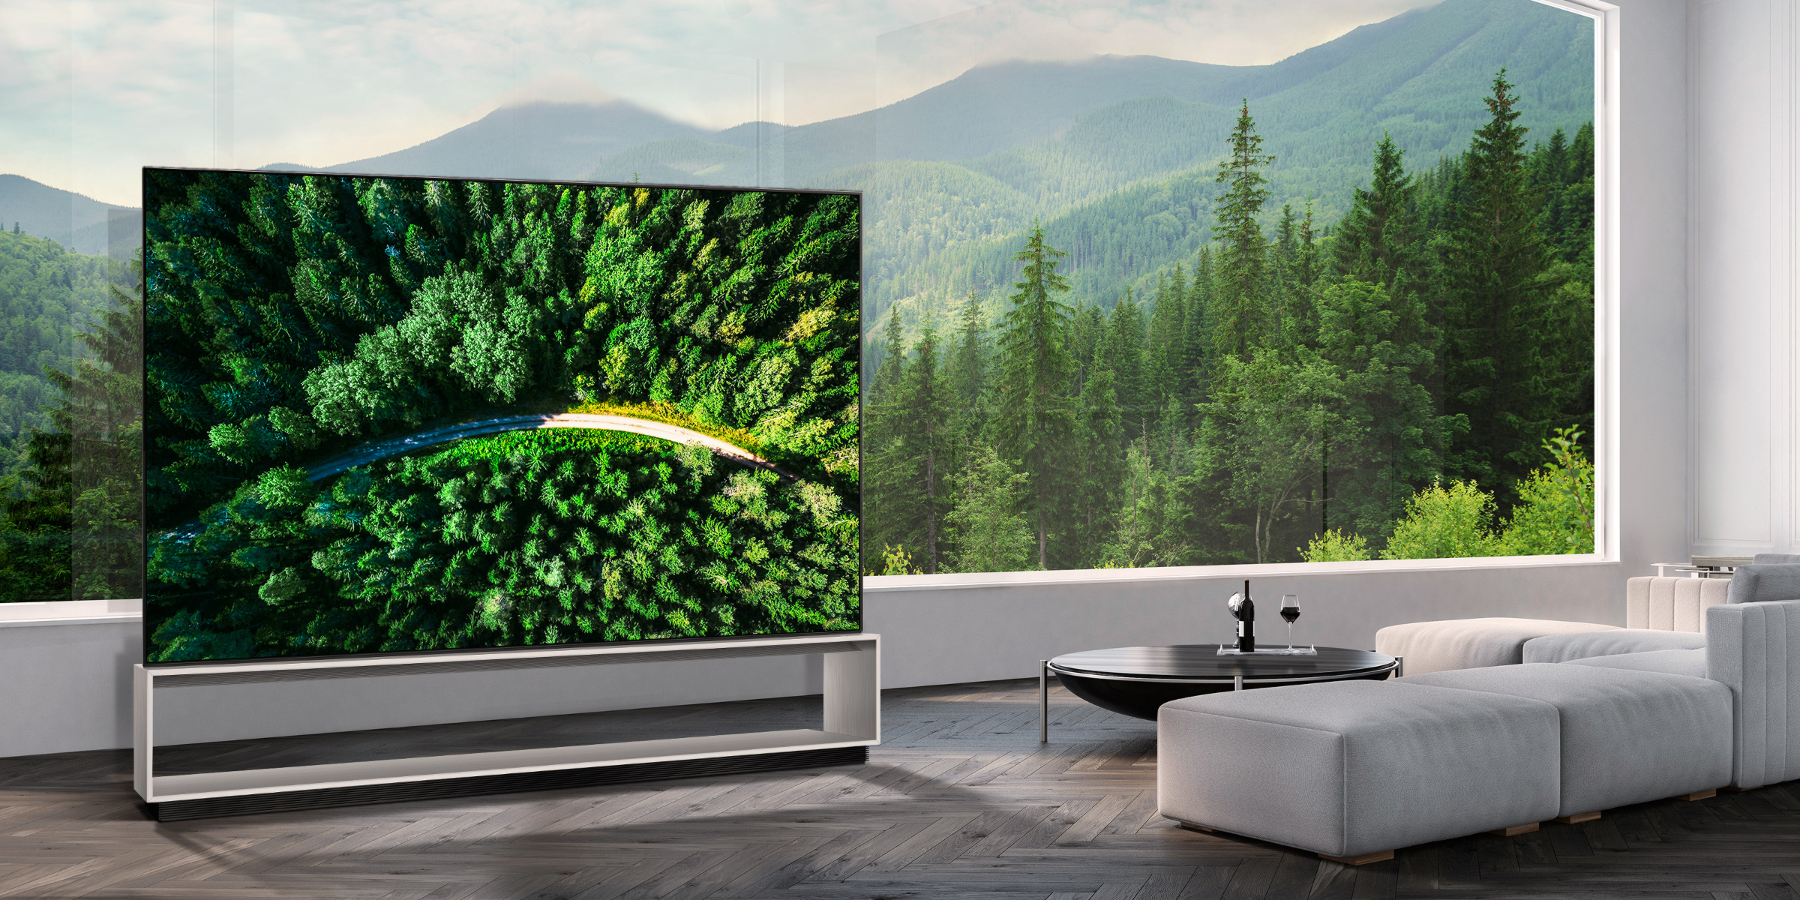 LG 8K OLED-televisie (model 88Z9)